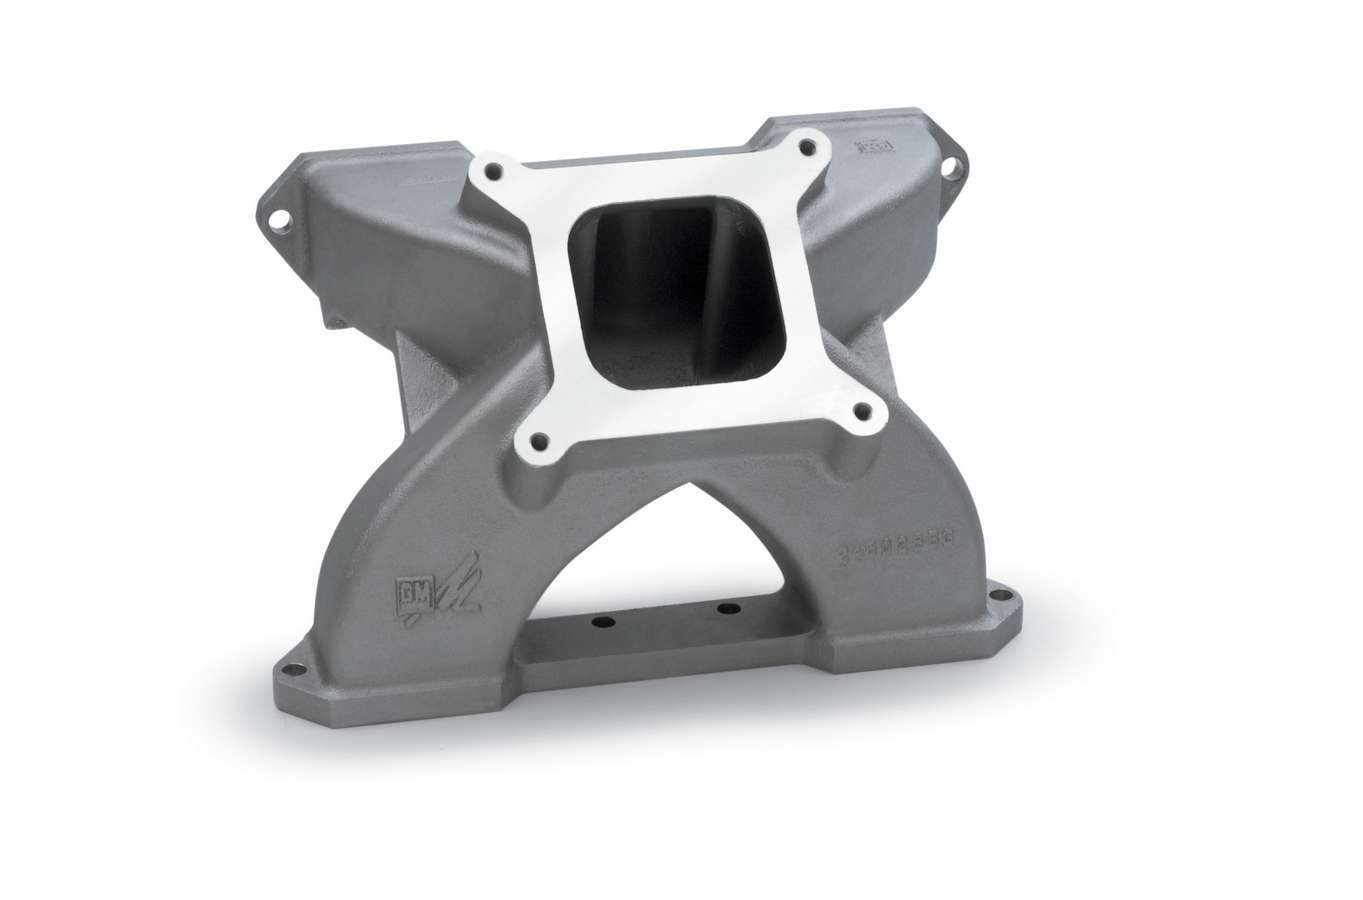 Chevrolet Performance SBC Intake Manifold - Spider Design